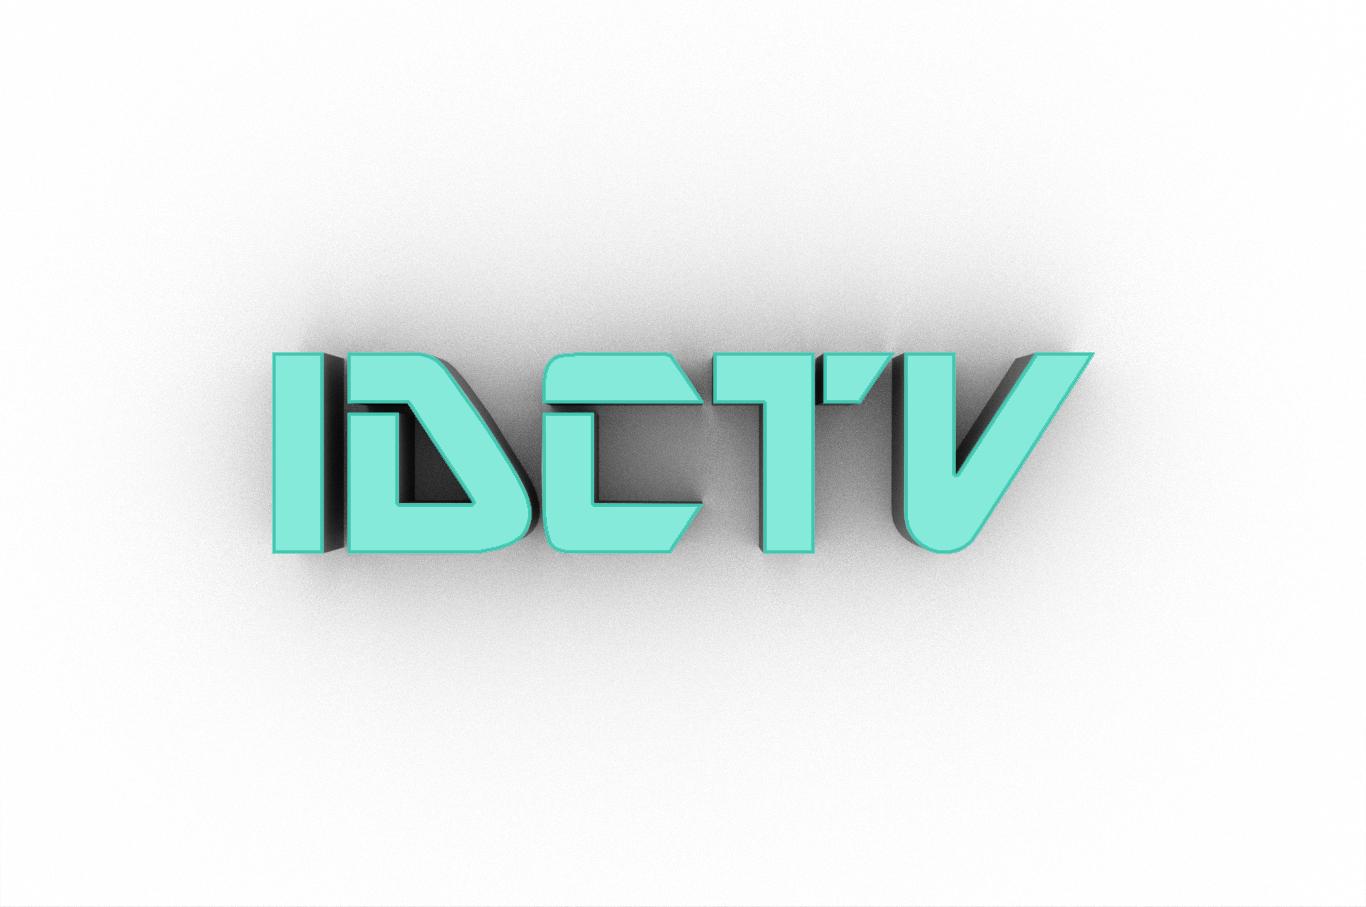 Idctv